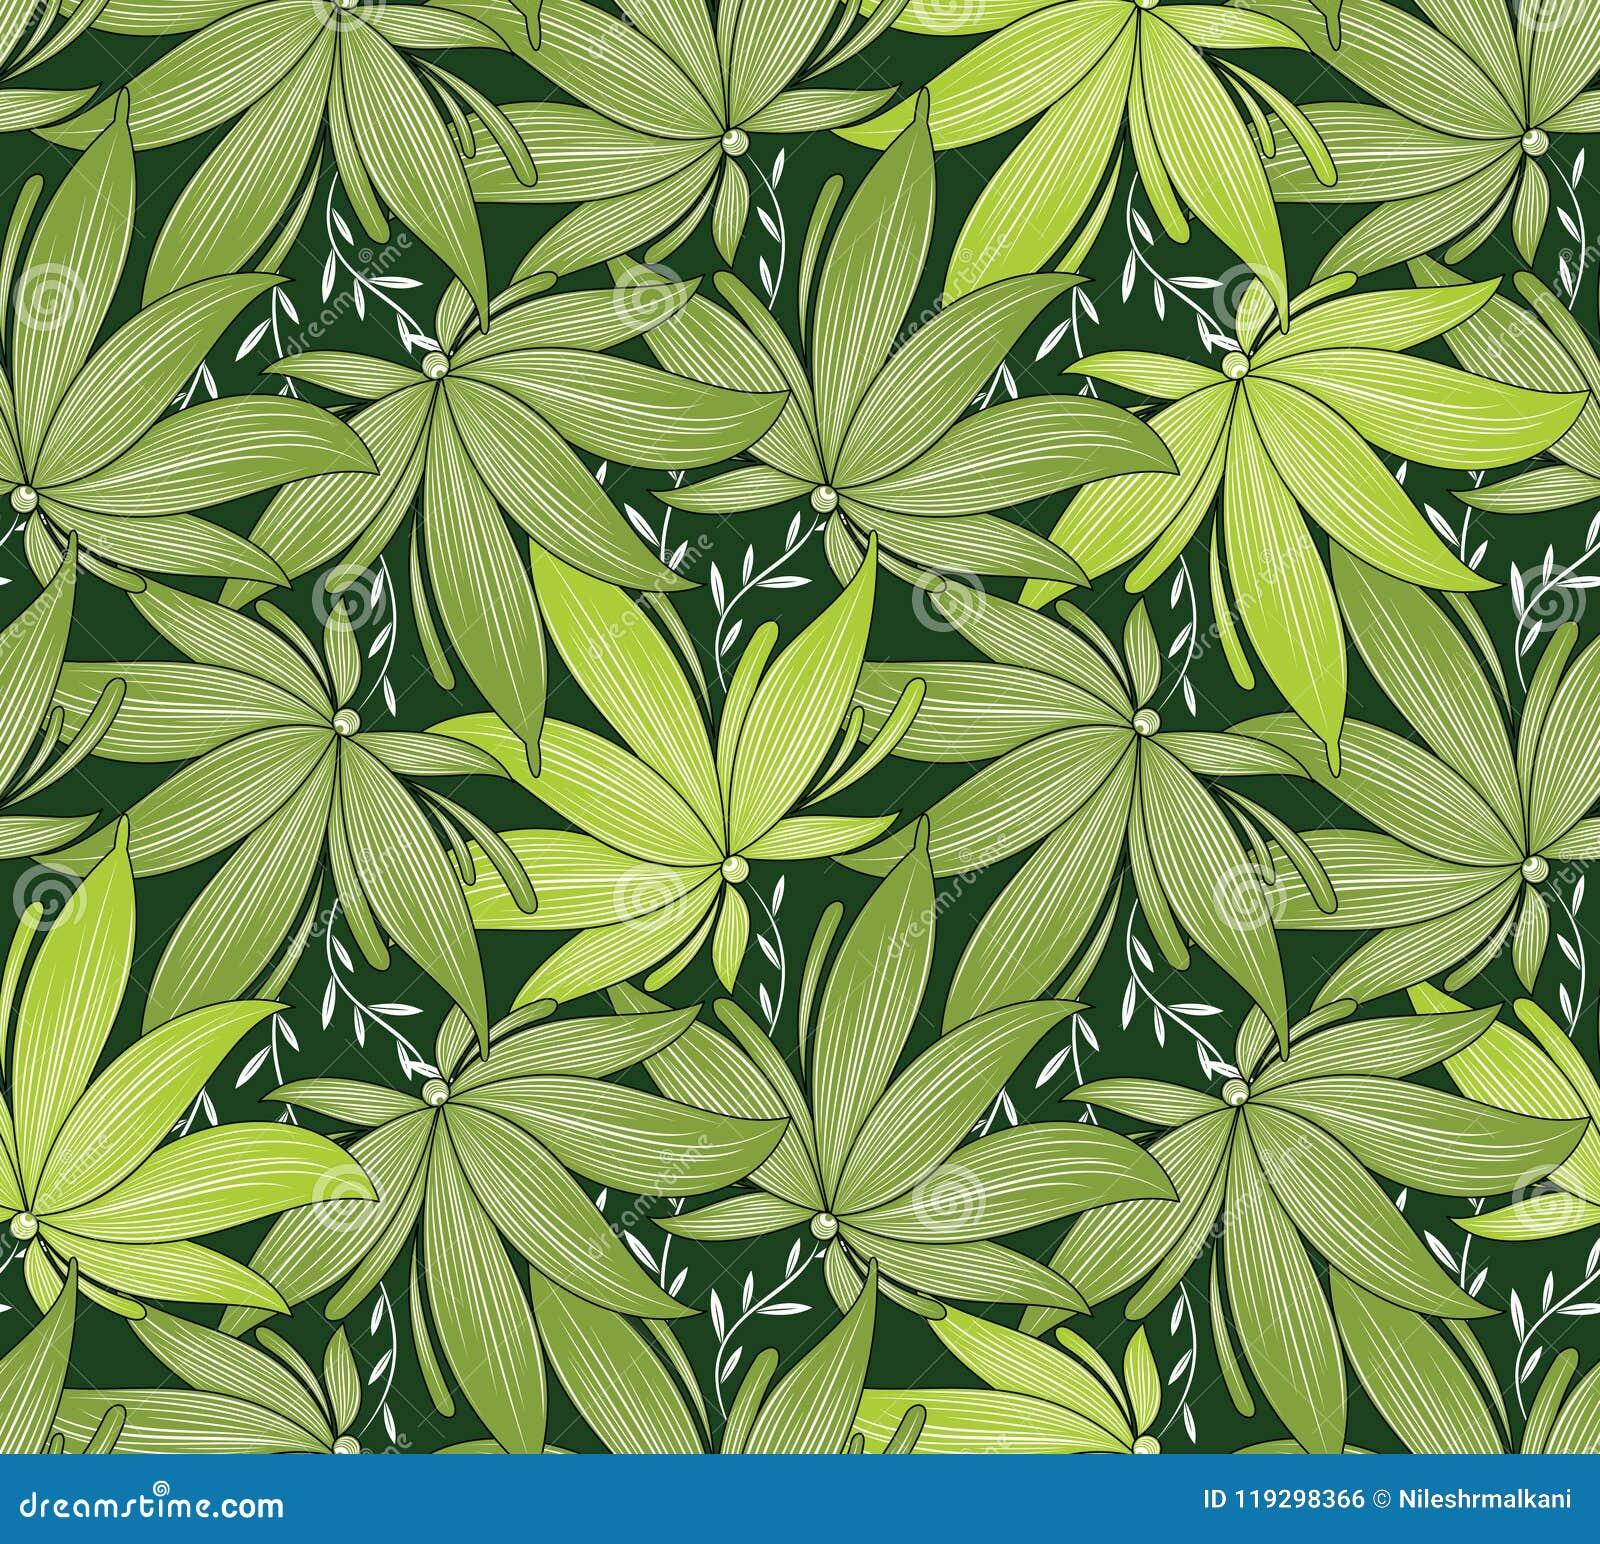 Seamless Fancy Green Leaves Wallpaper Stock Vector Illustration Of